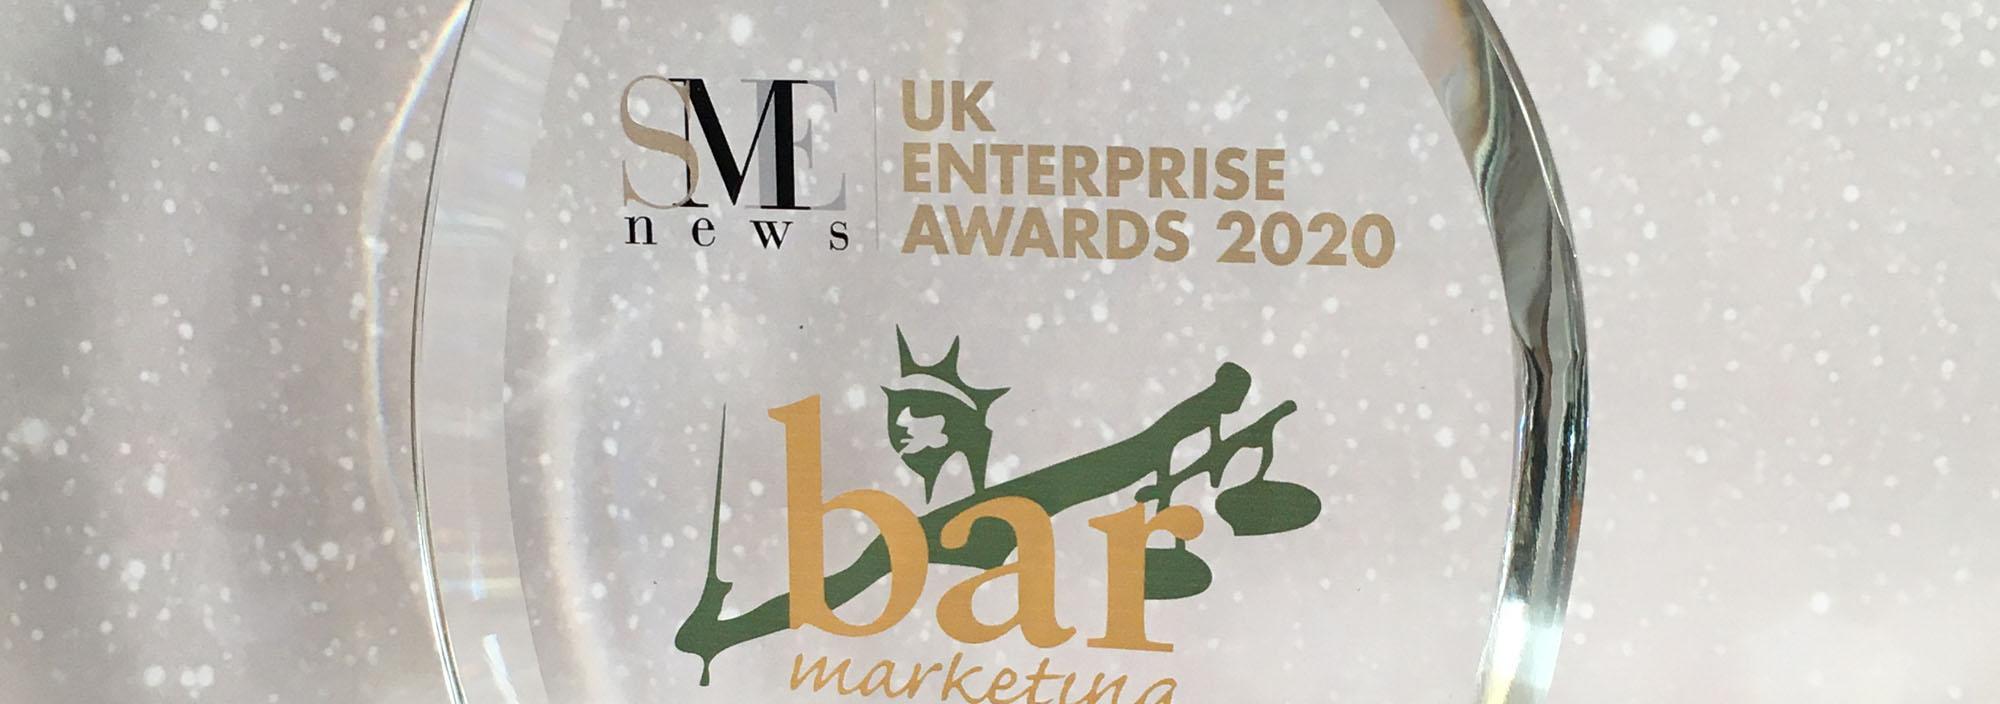 SME UK Awards winner marketing agency